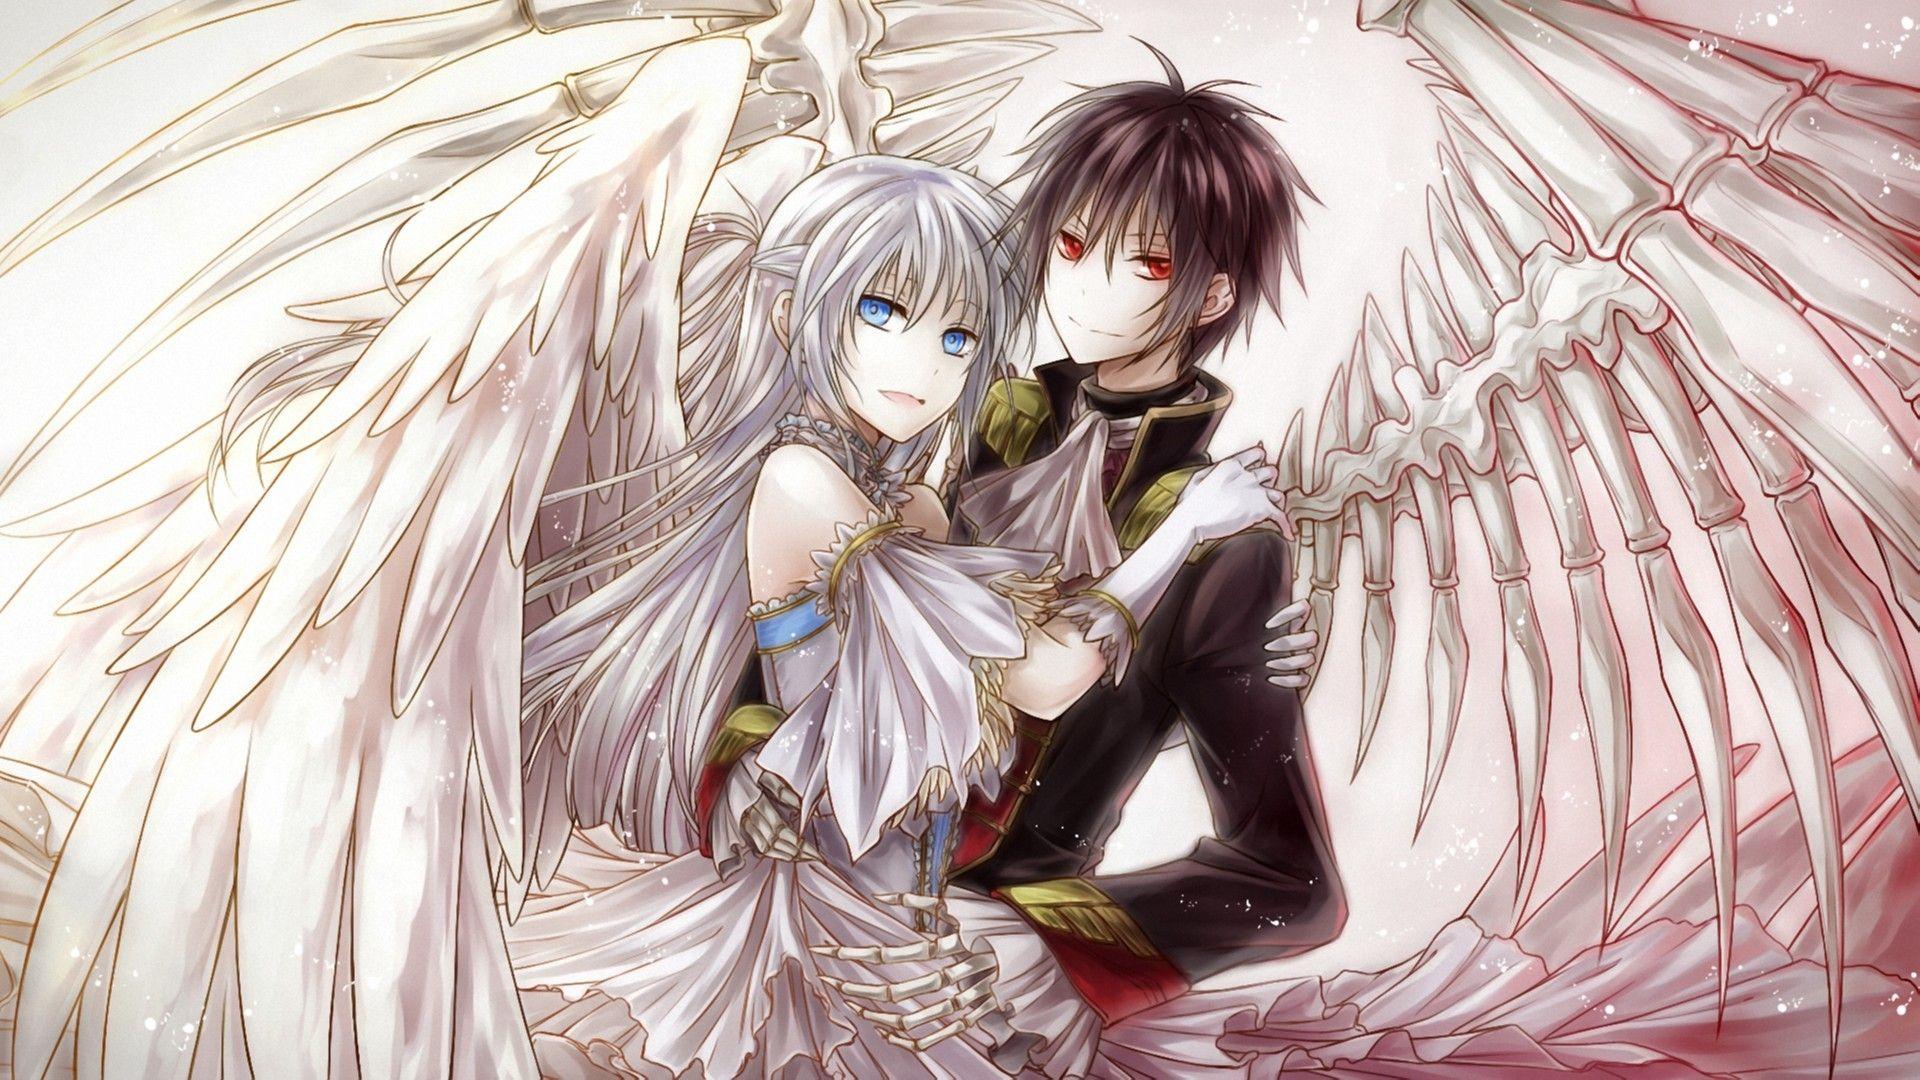 Großzügig Süße Anime Engel Malvorlagen Bilder - Entry Level Resume ...